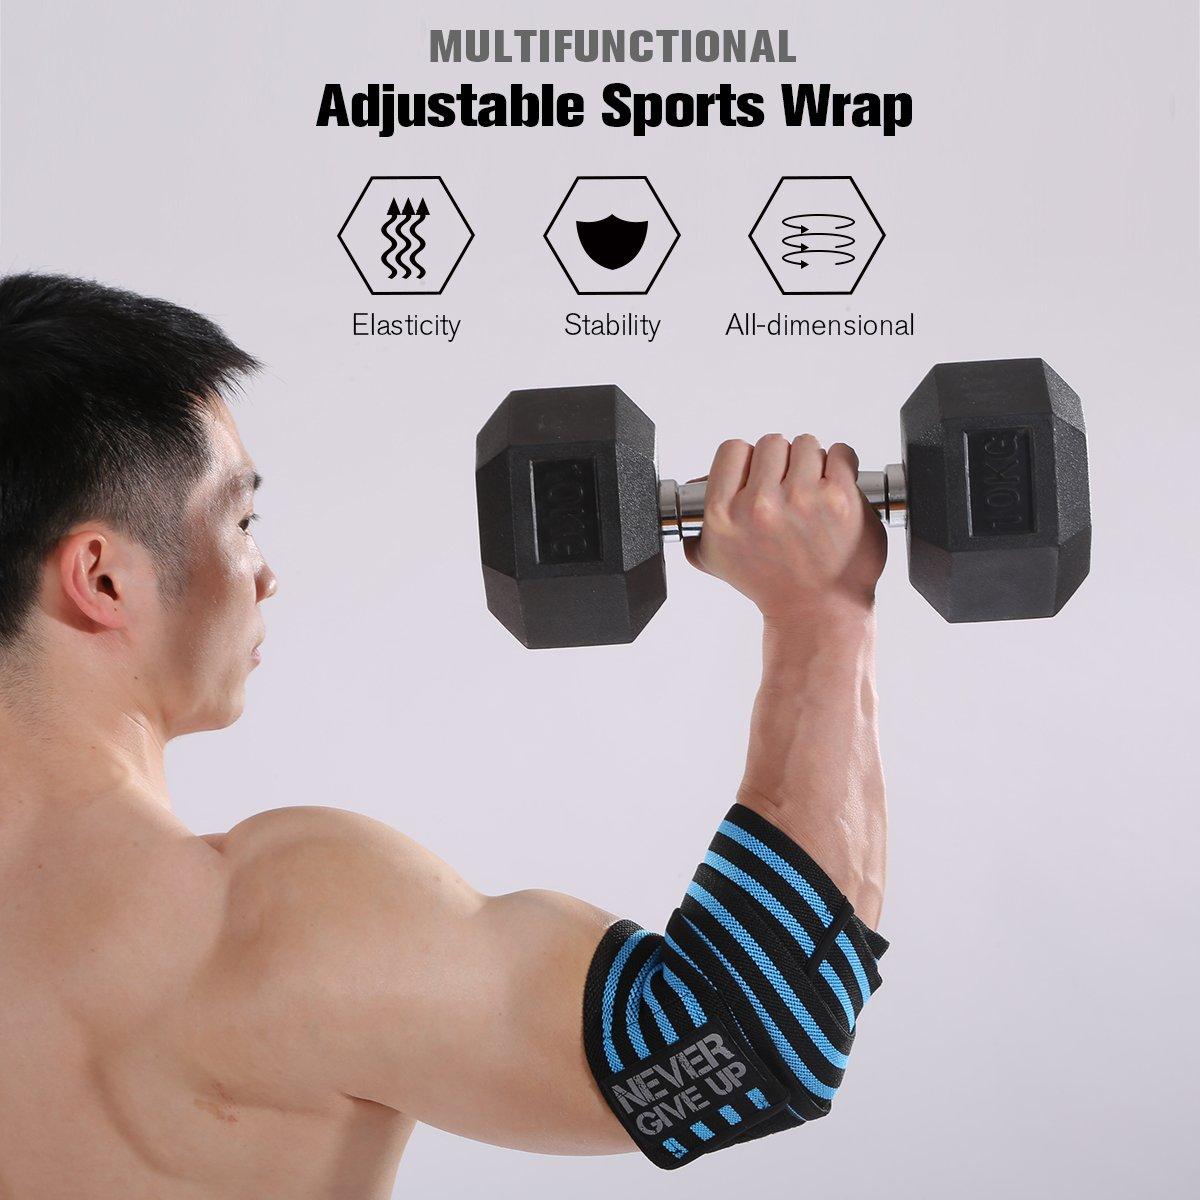 Codo Wraps bracego ajustable codo apoya tirantes vendaje estilo profesional anti-sprain transpirable de compresión 3 colores para levantamiento de ...